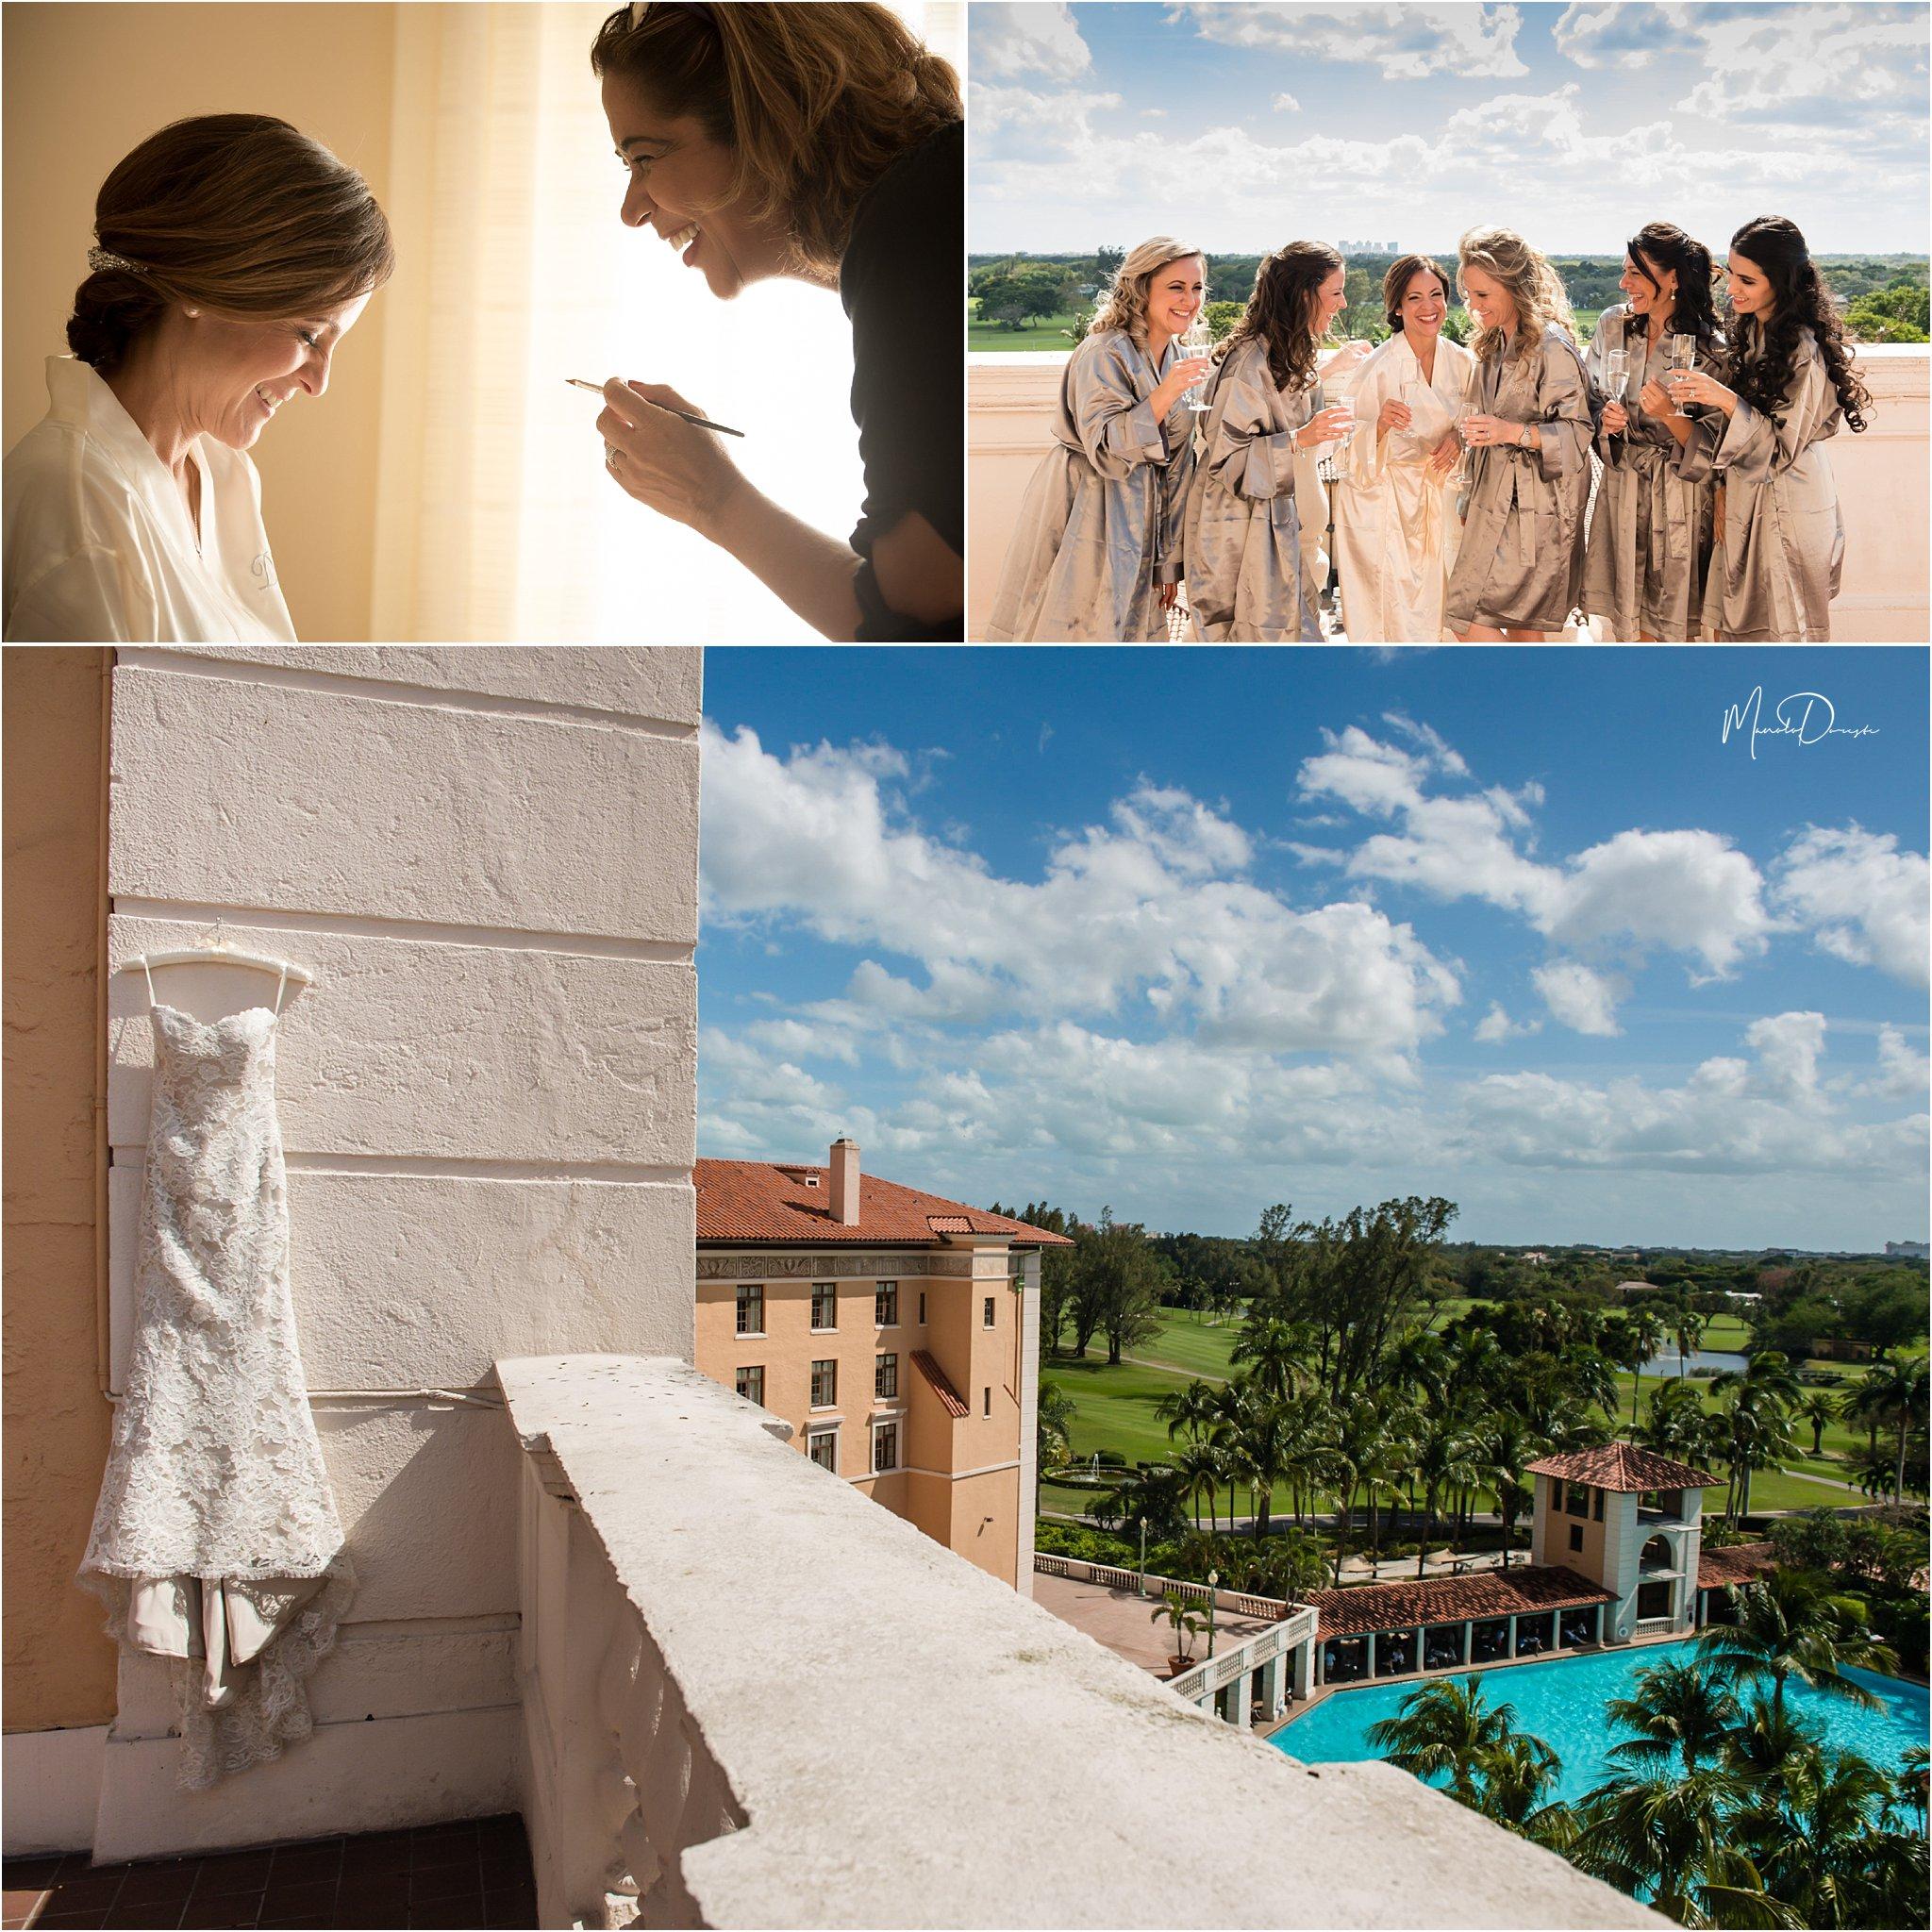 00830_ManoloDoreste_InFocusStudios_Wedding_Family_Photography_Miami_MiamiPhotographer.jpg